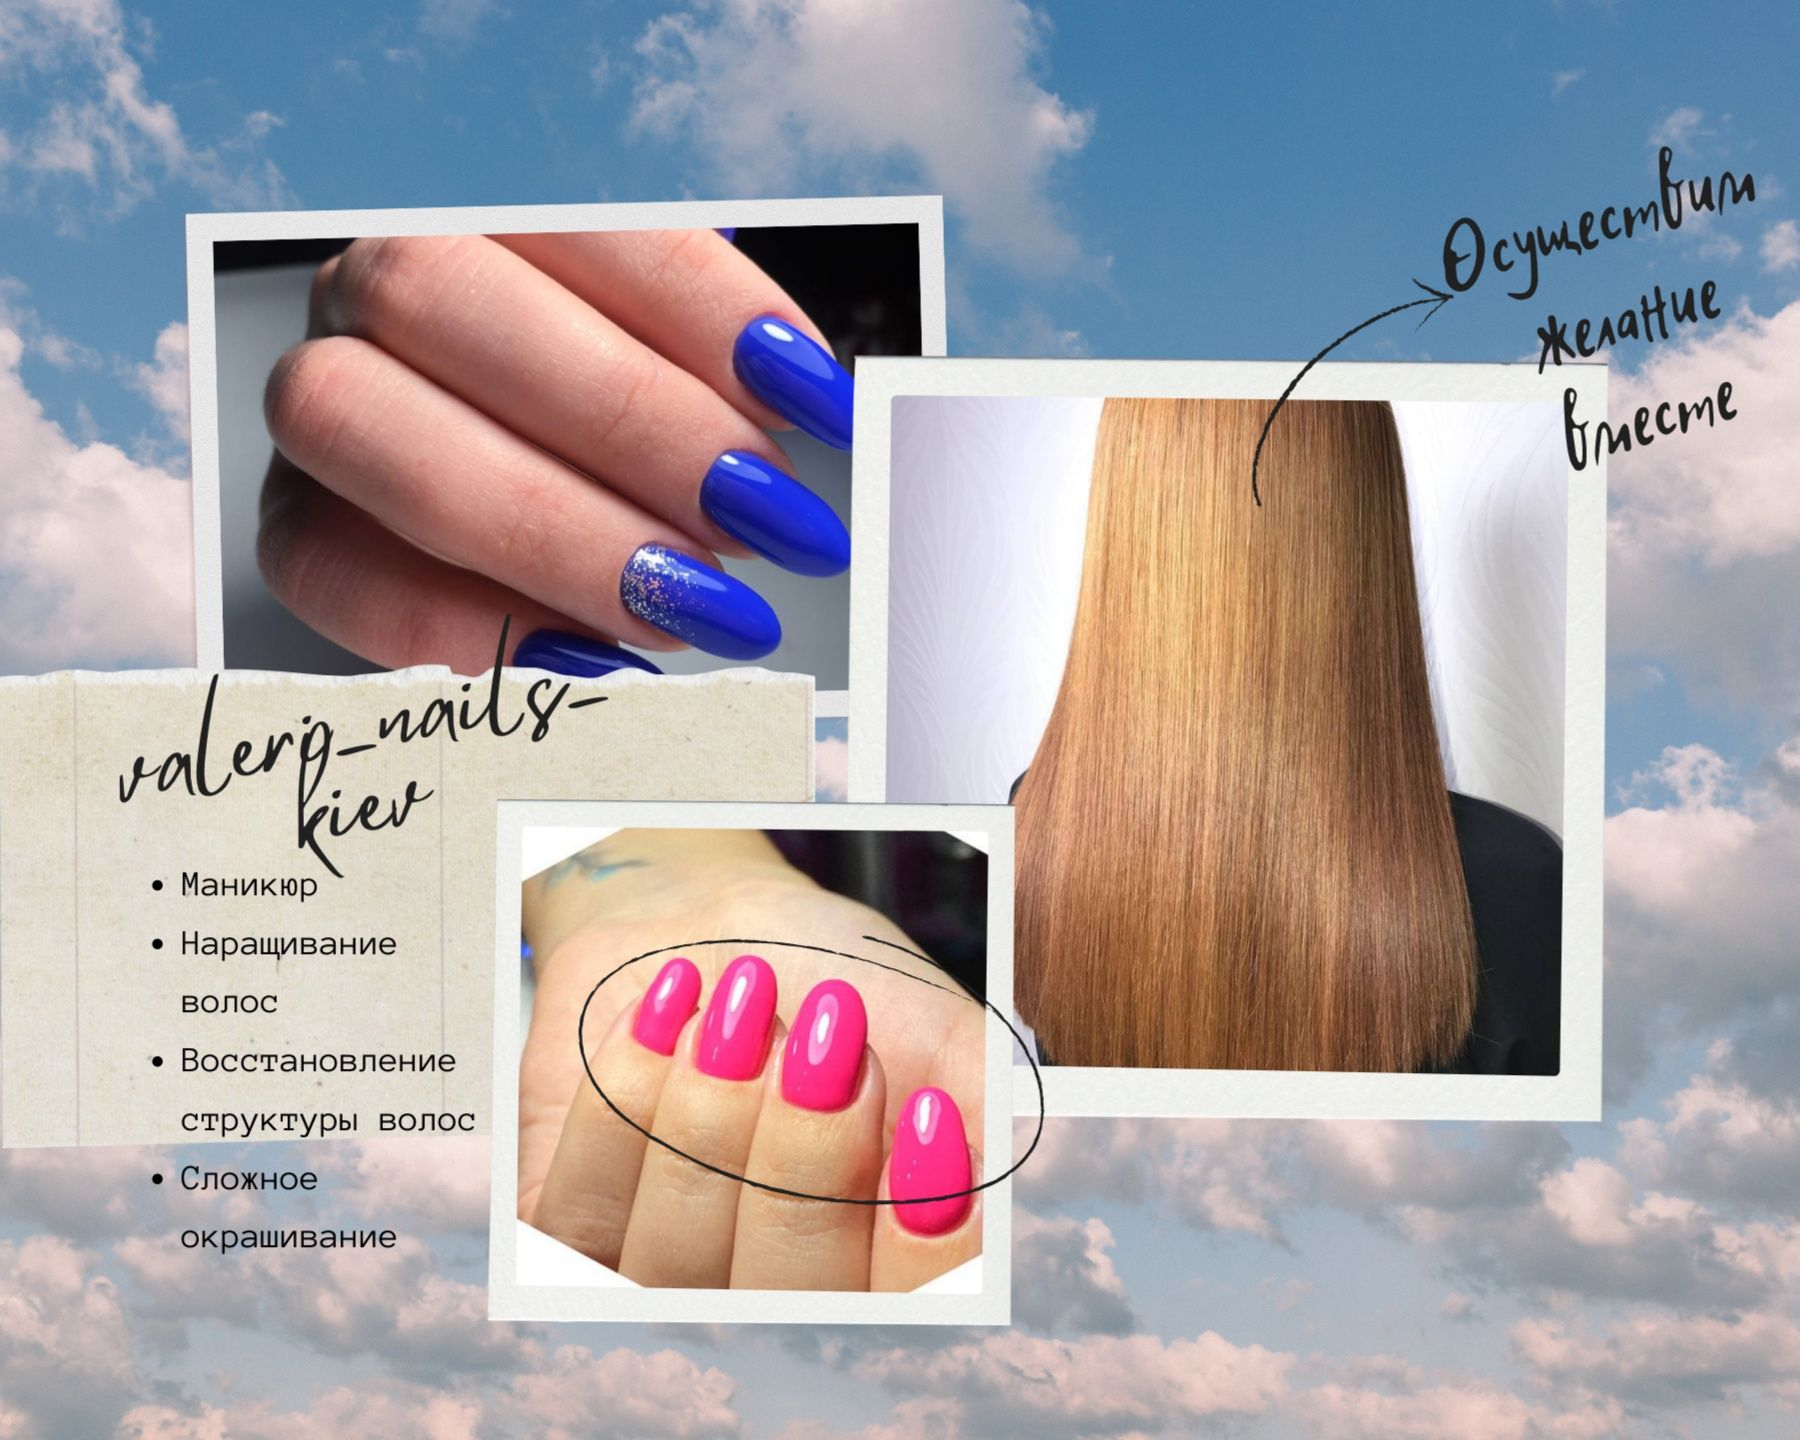 Наращивание волос, Востановление волос, Наращивание ногтей, Маникюр